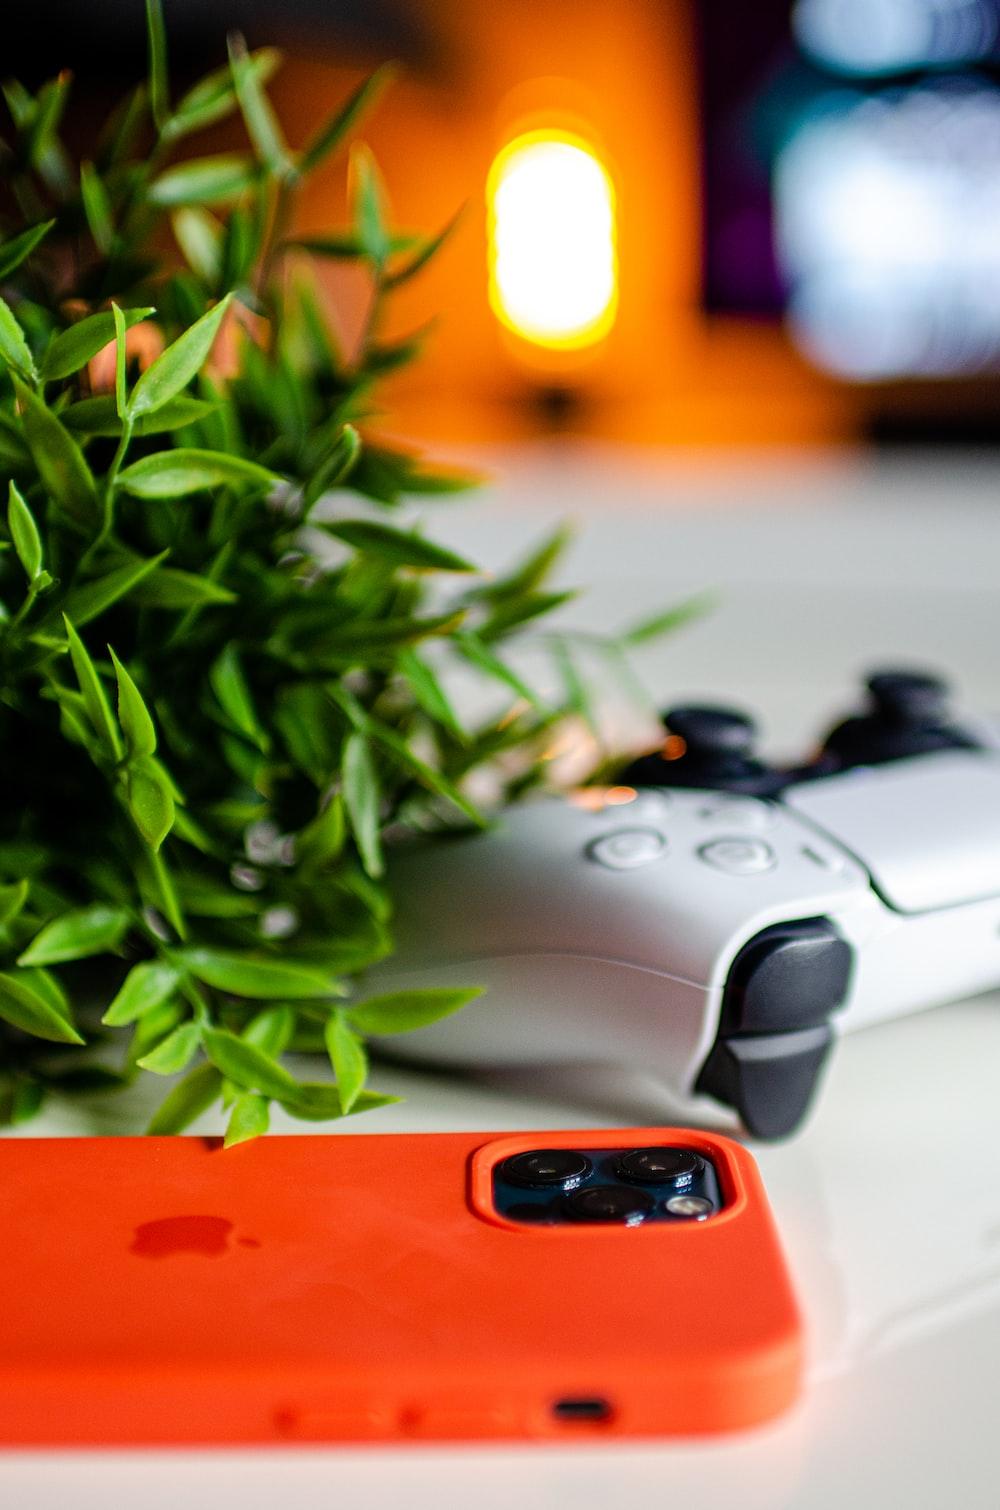 black and orange game controller